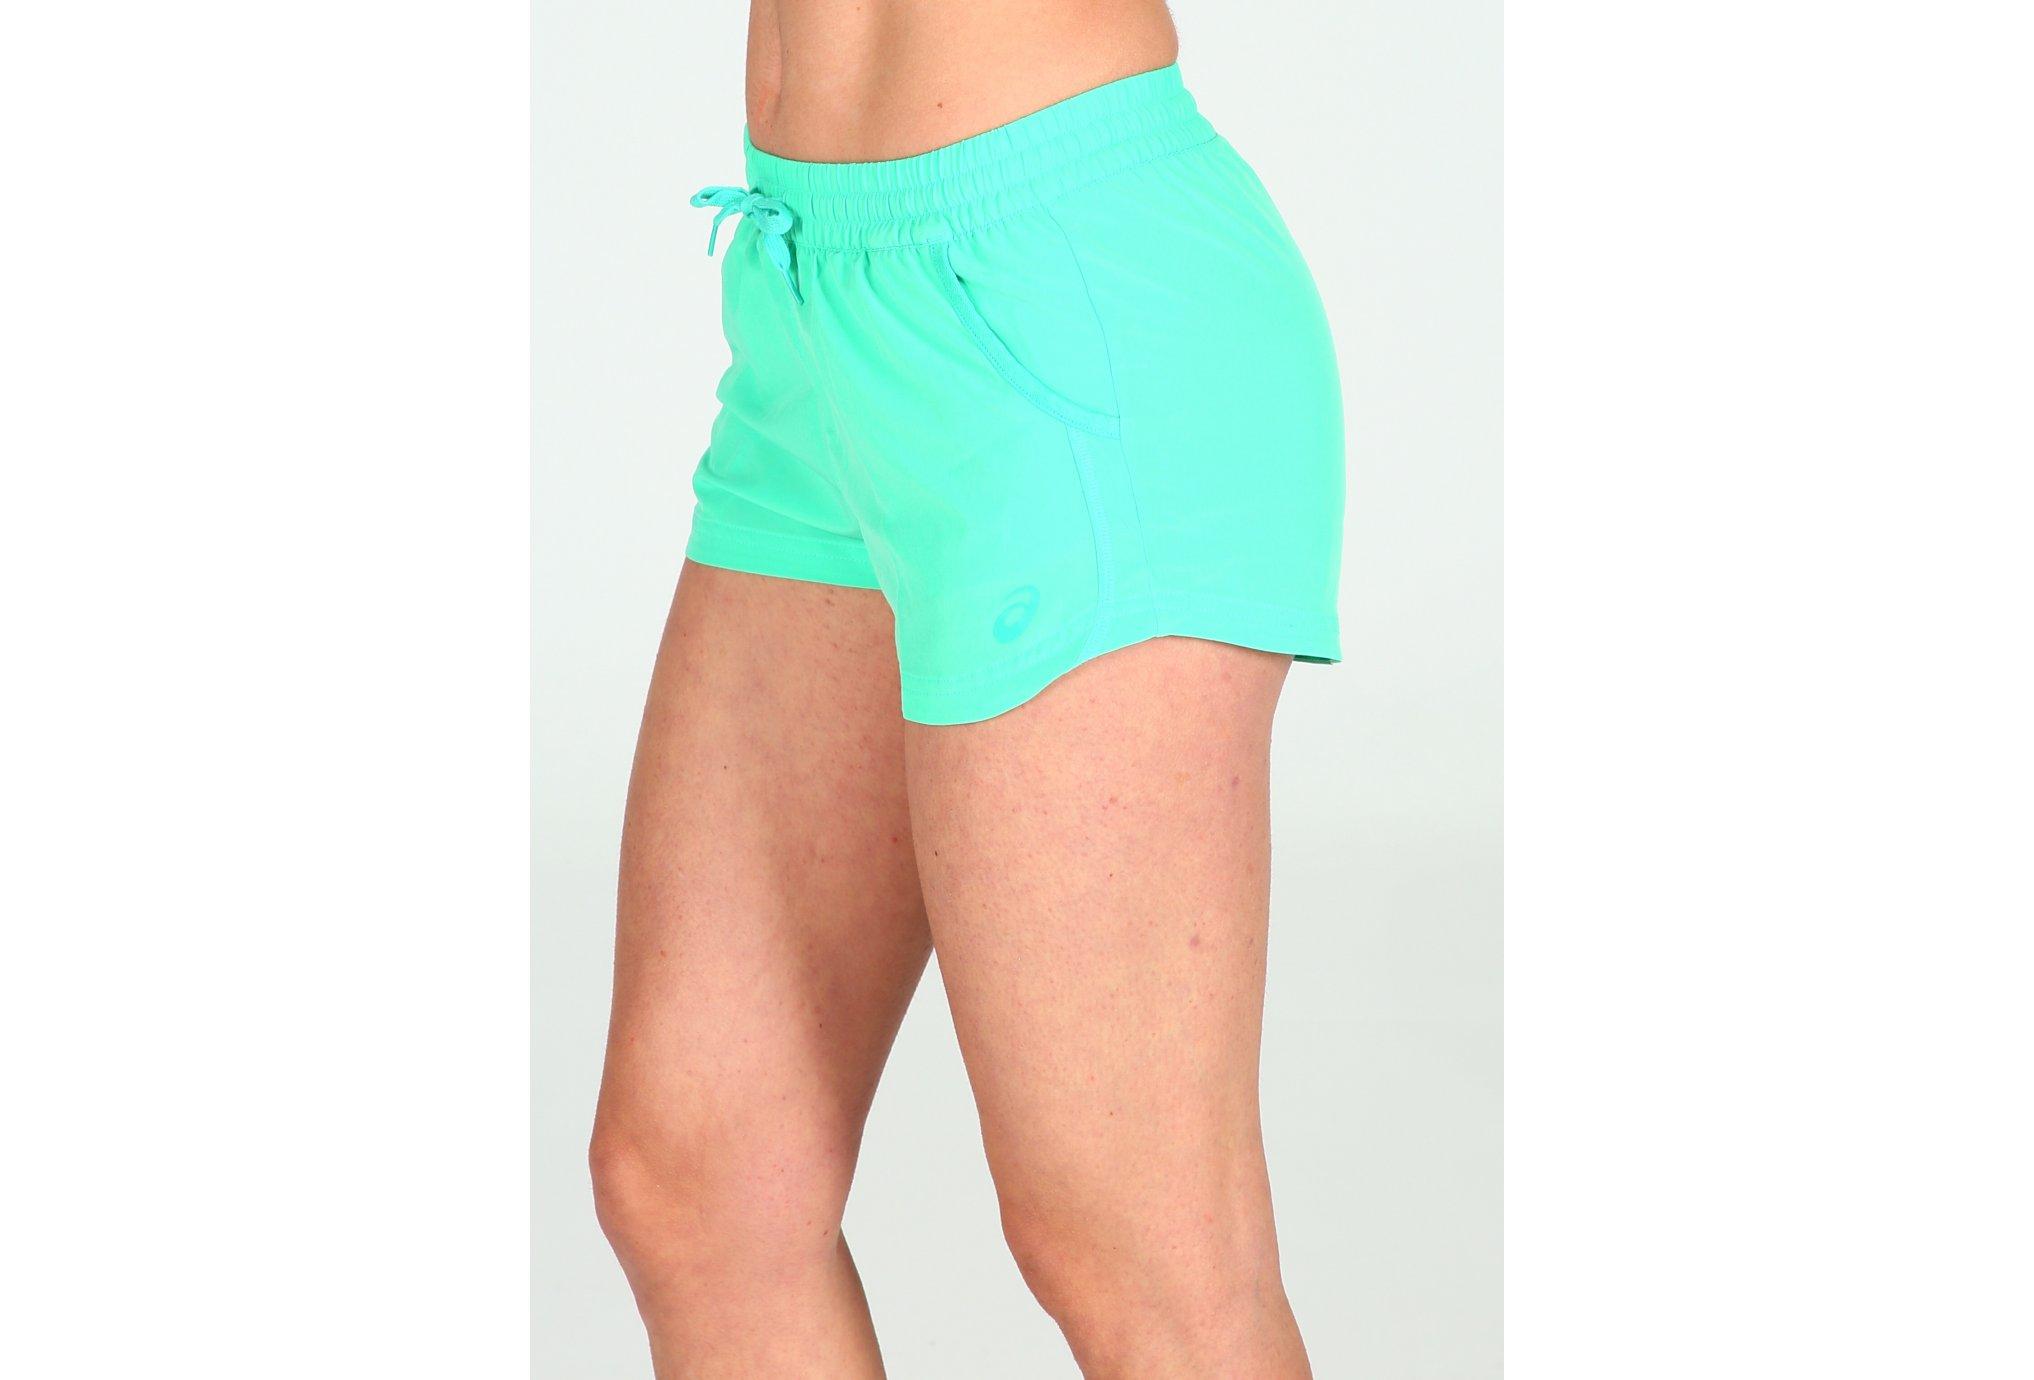 Asics Short 2 in 1 Woven W vêtement running femme